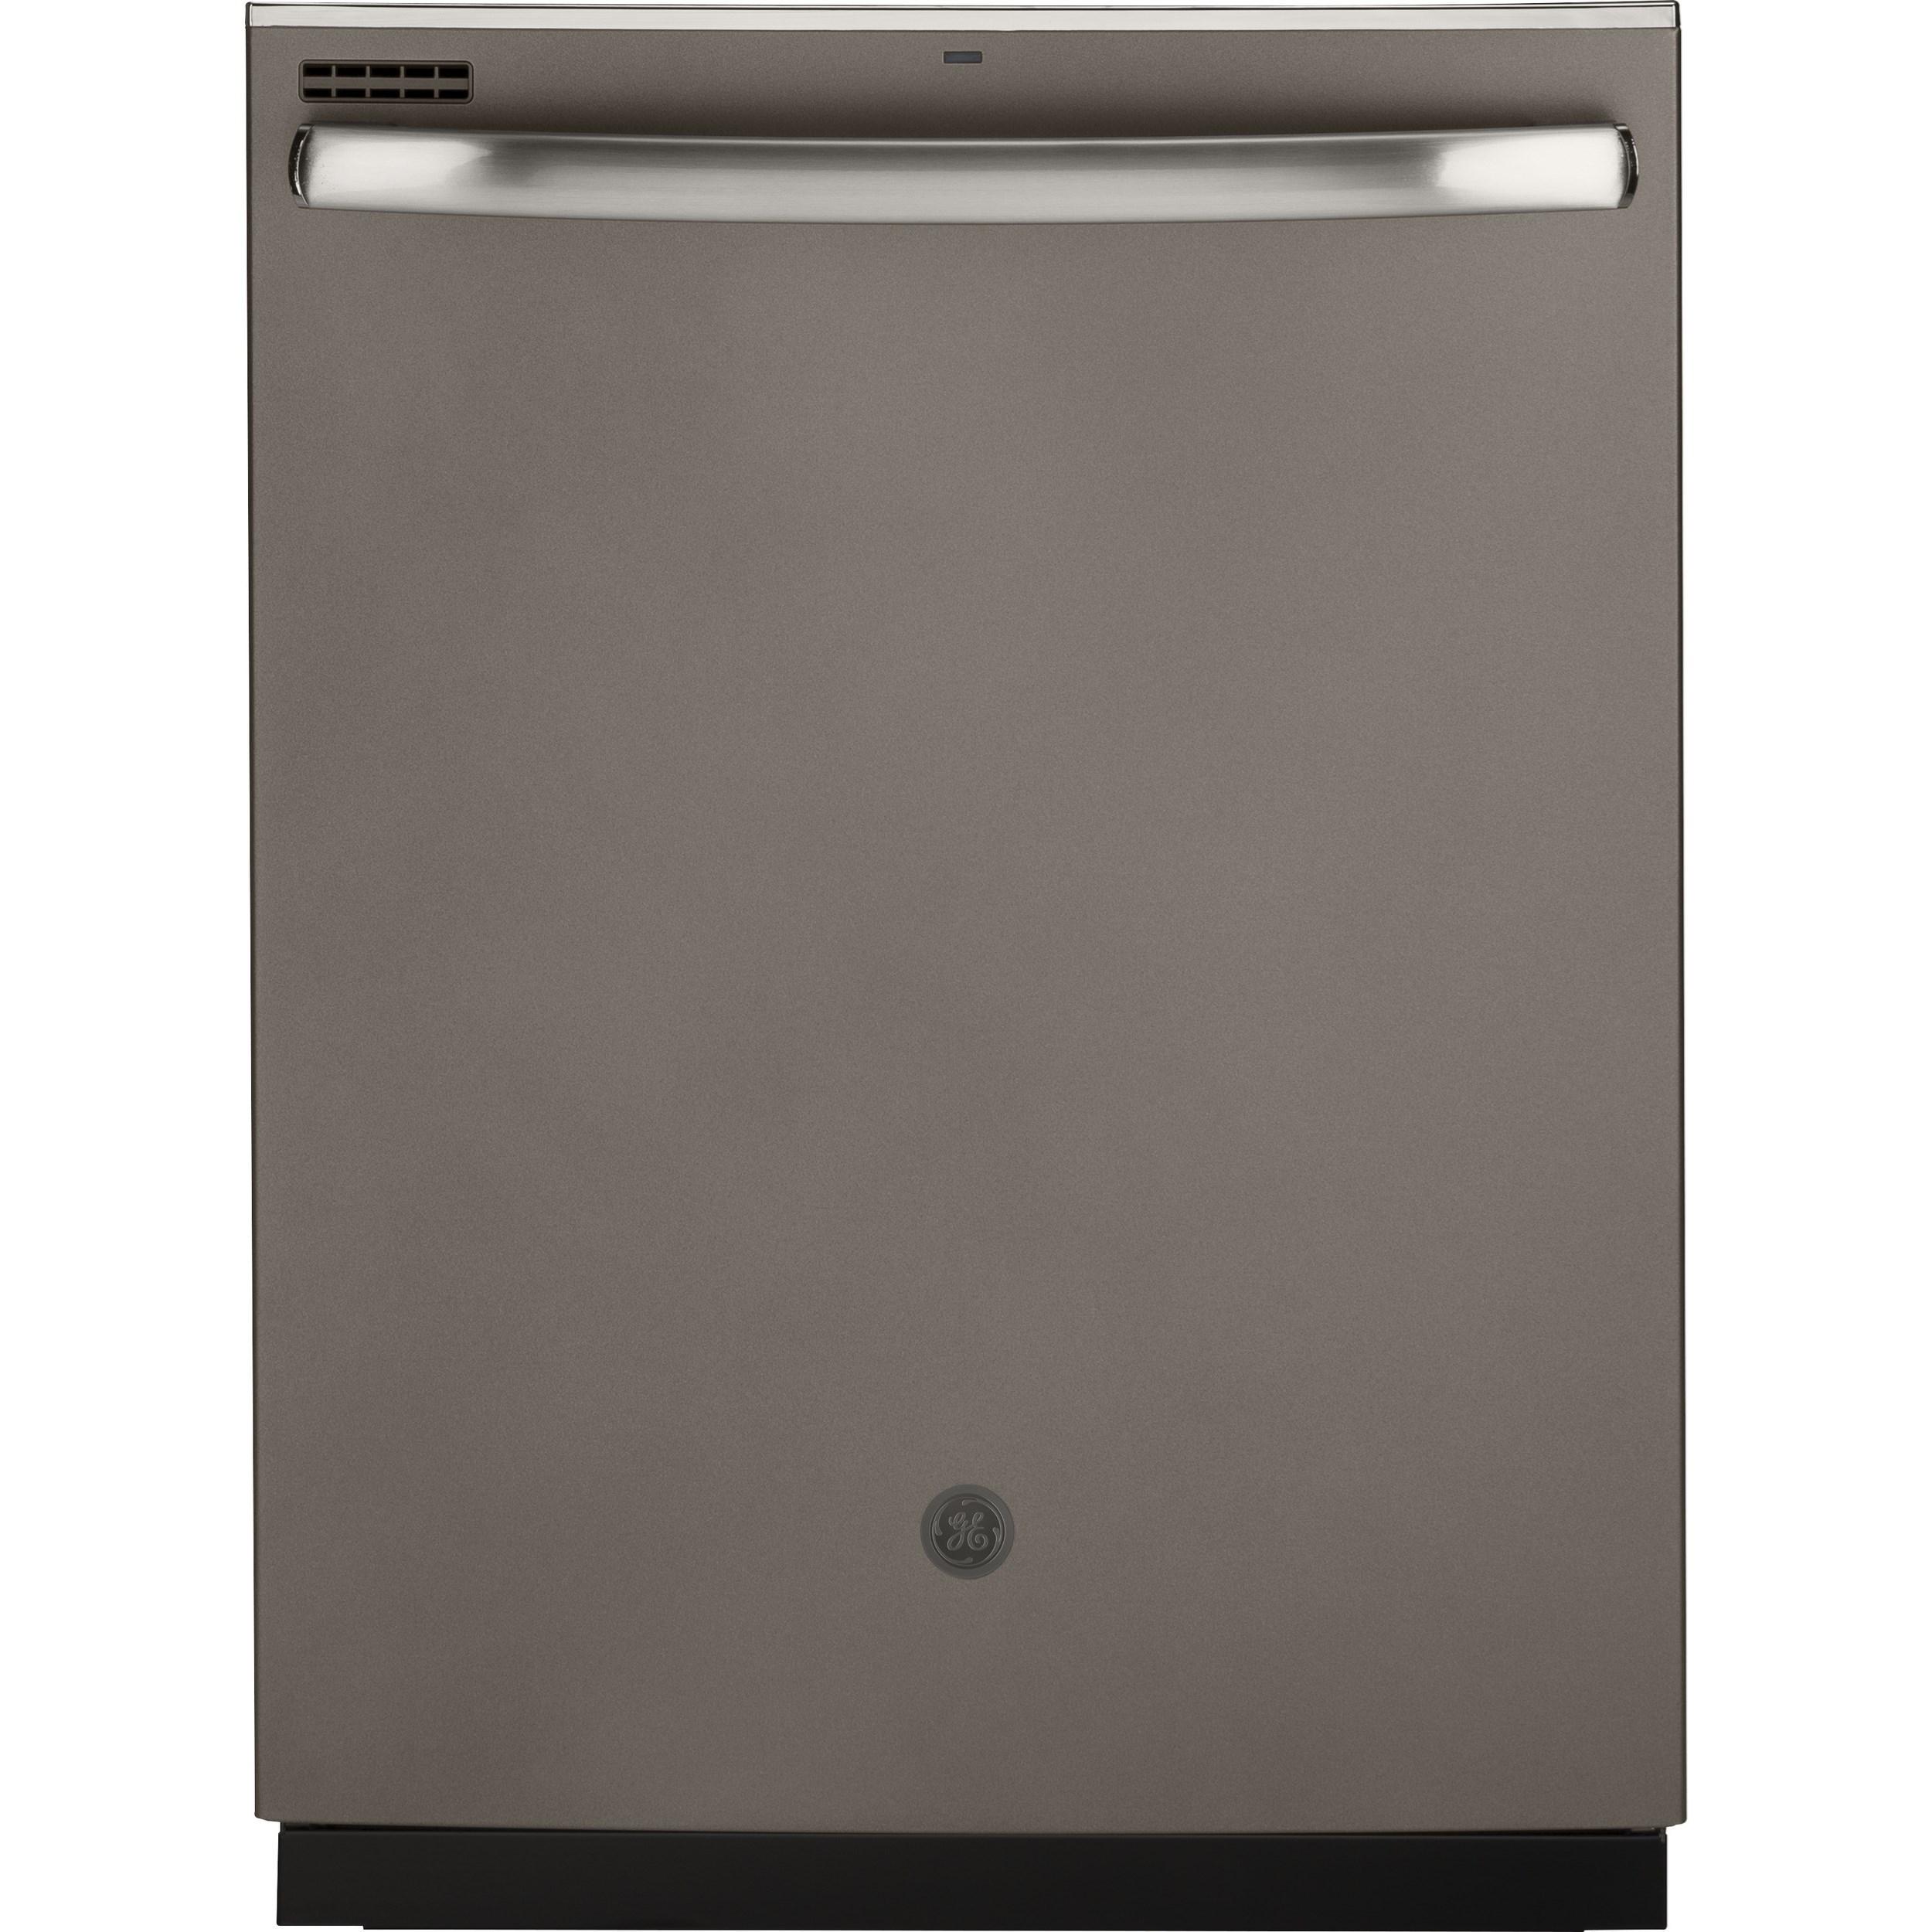 Dishwashers GE® Smart Hybrid Dishwasher by GE Appliances at Furniture and ApplianceMart